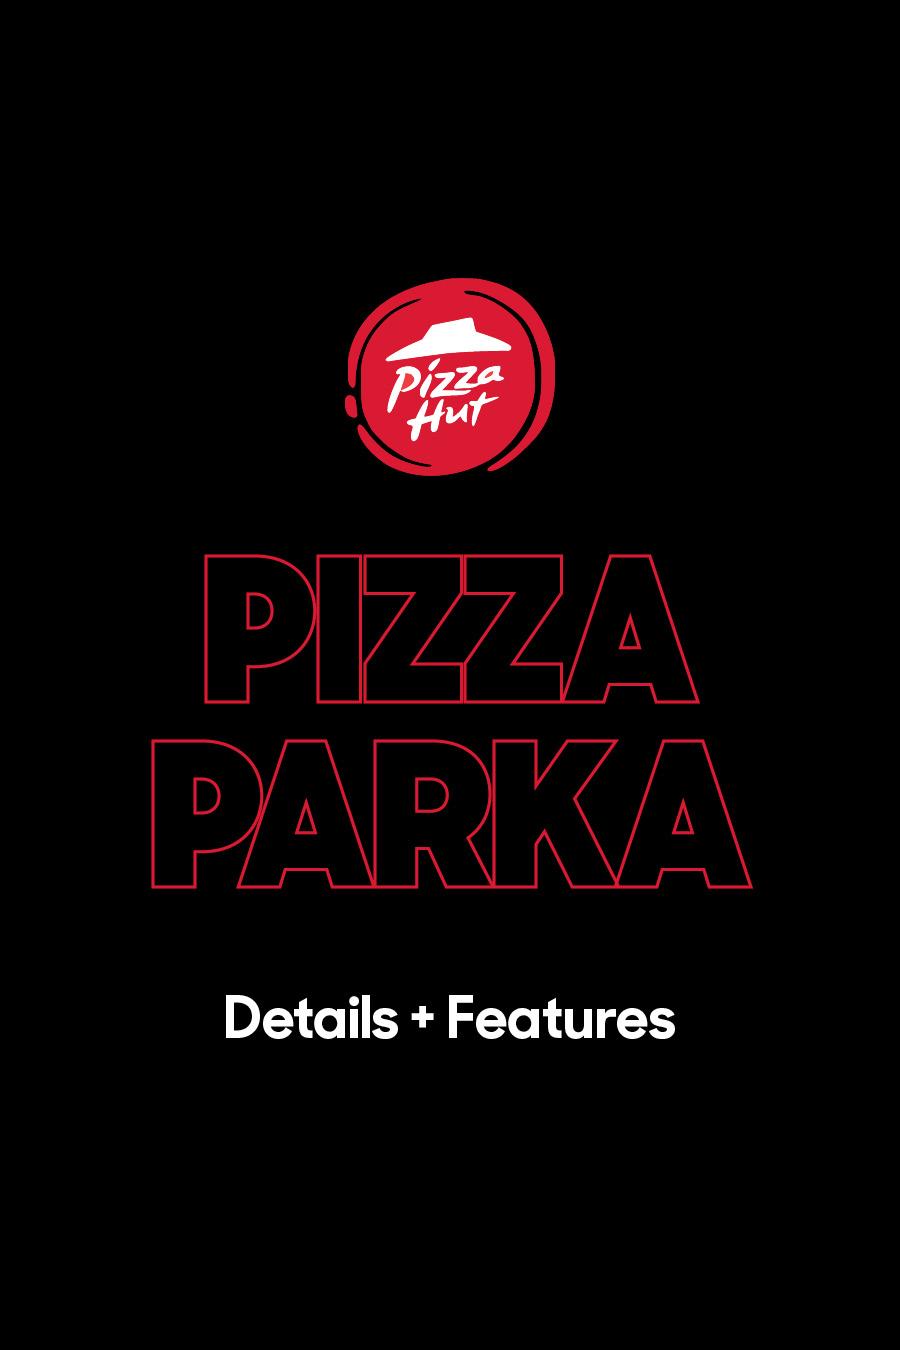 PH_PizzaParka_3x4.5_hang_tag_vF14.jpg